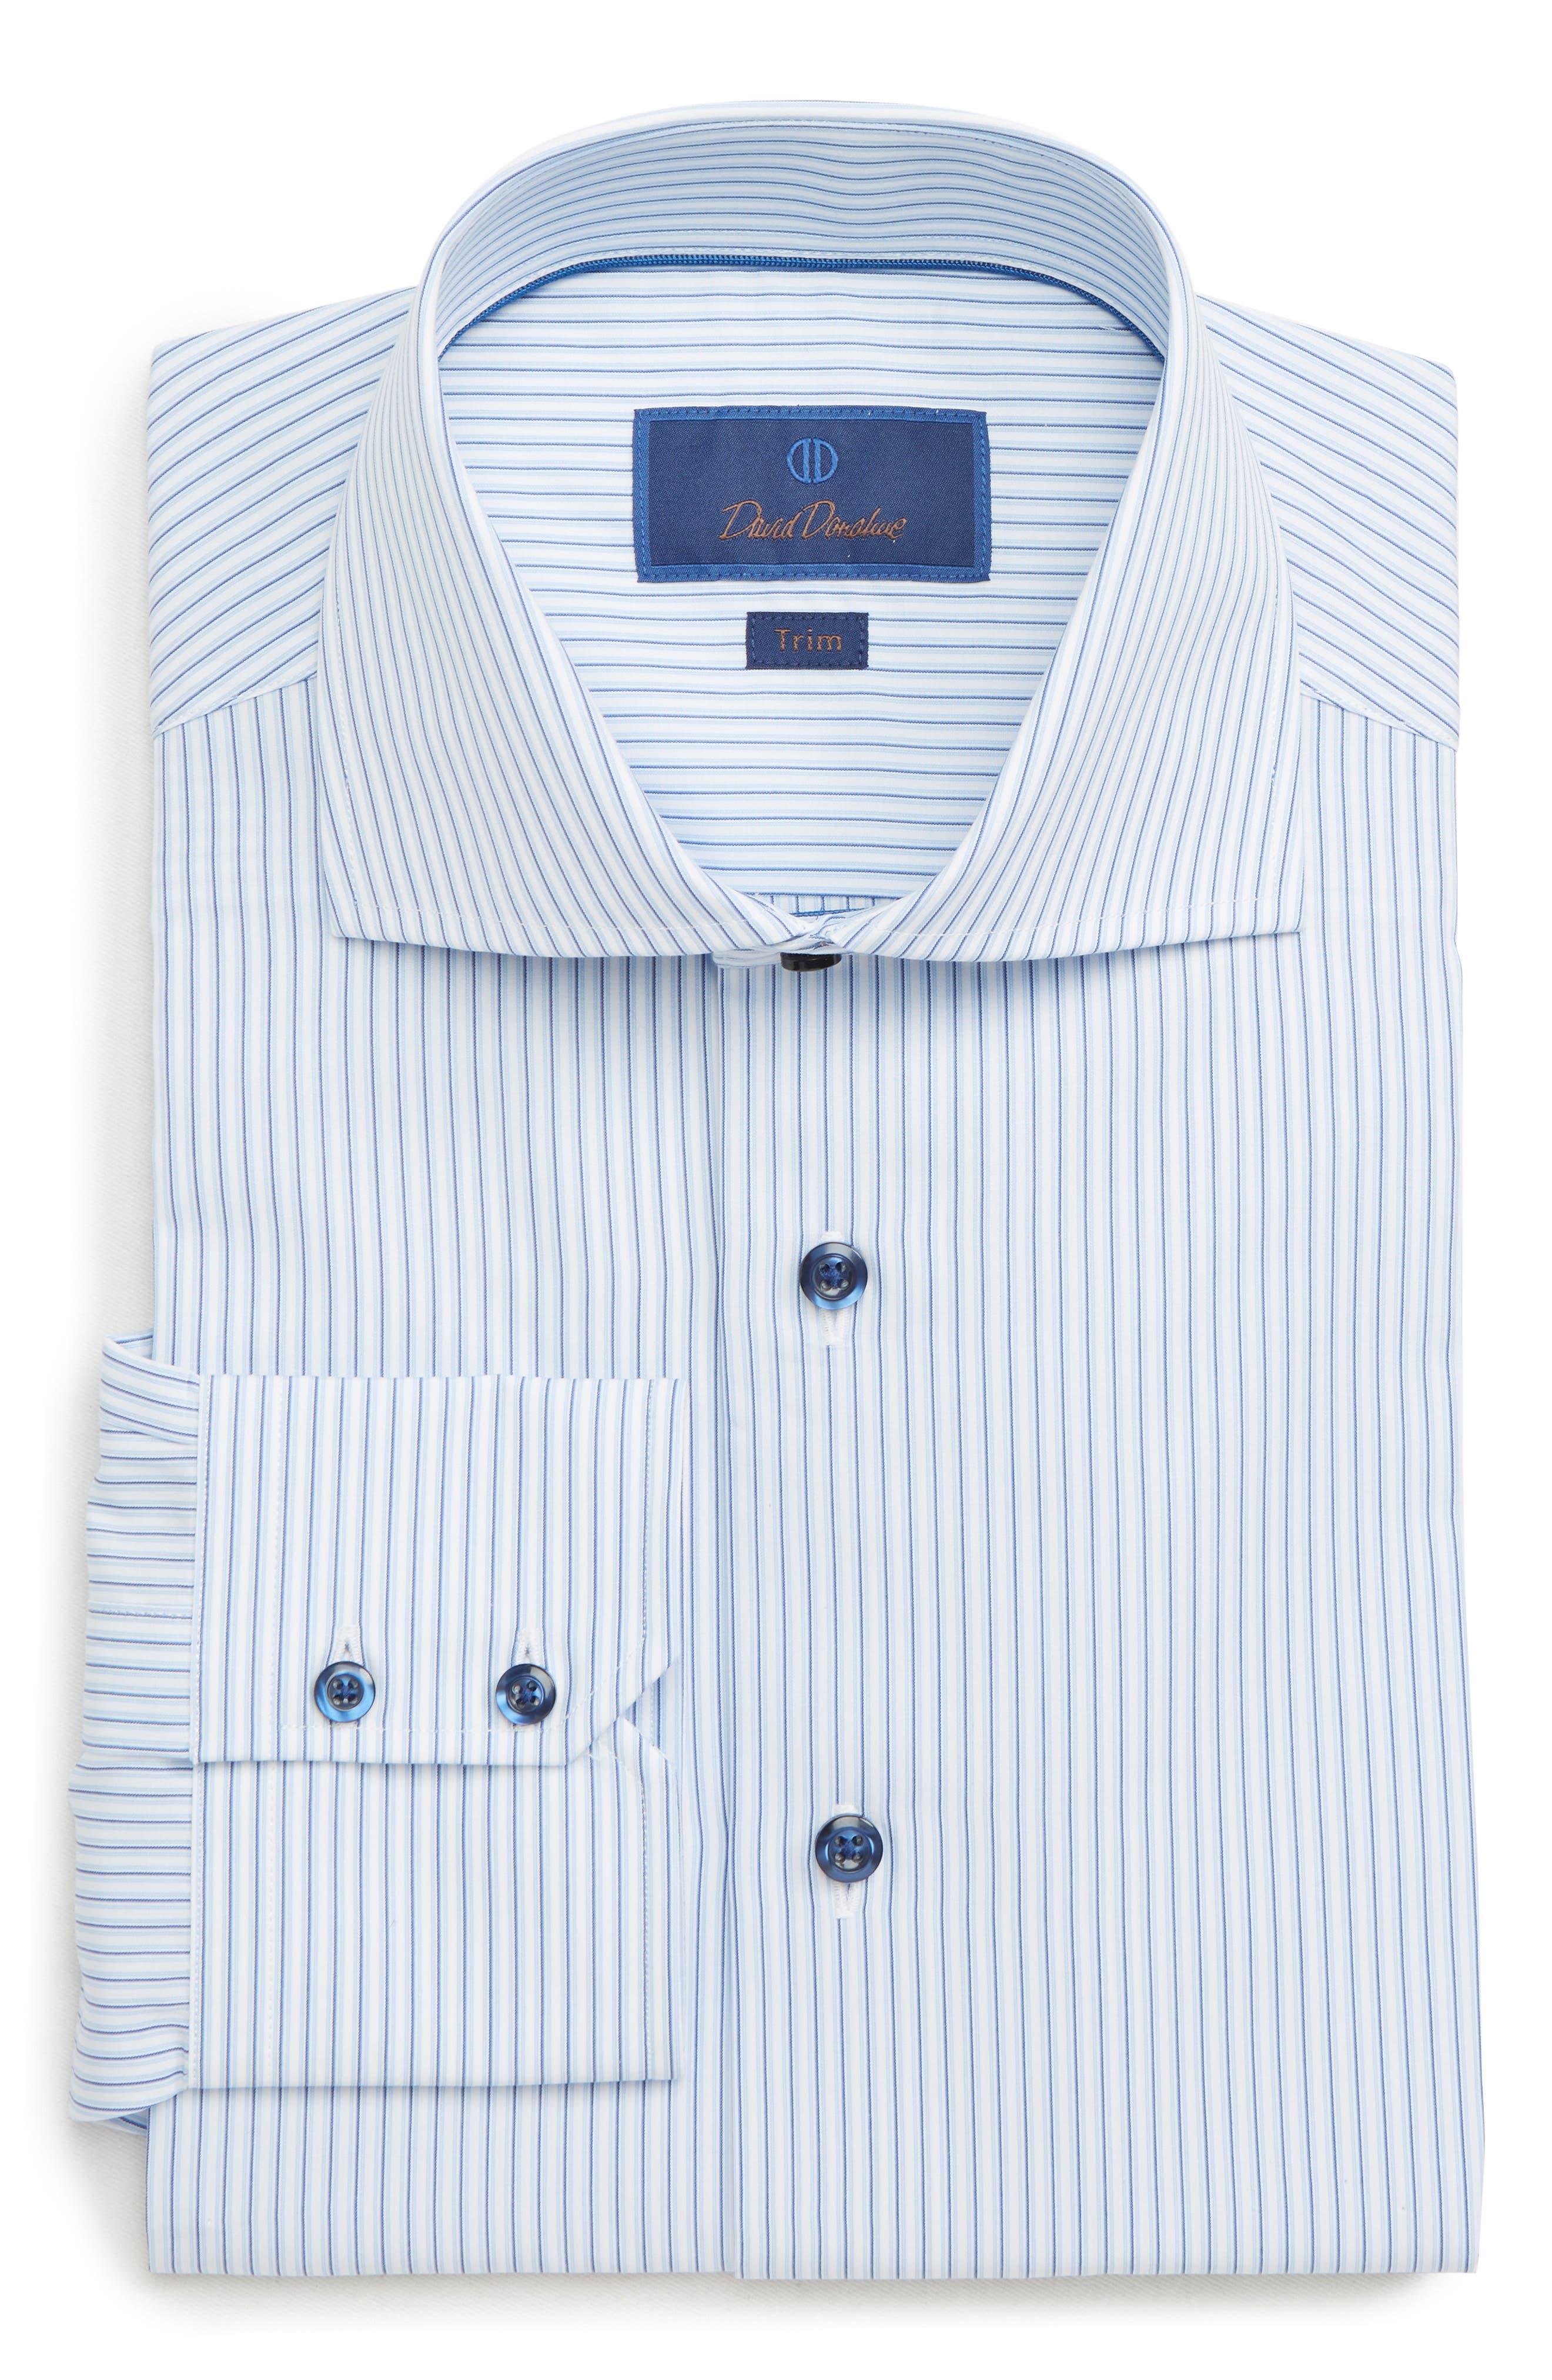 Trim Fit Stripe Dress Shirt,                             Main thumbnail 1, color,                             435